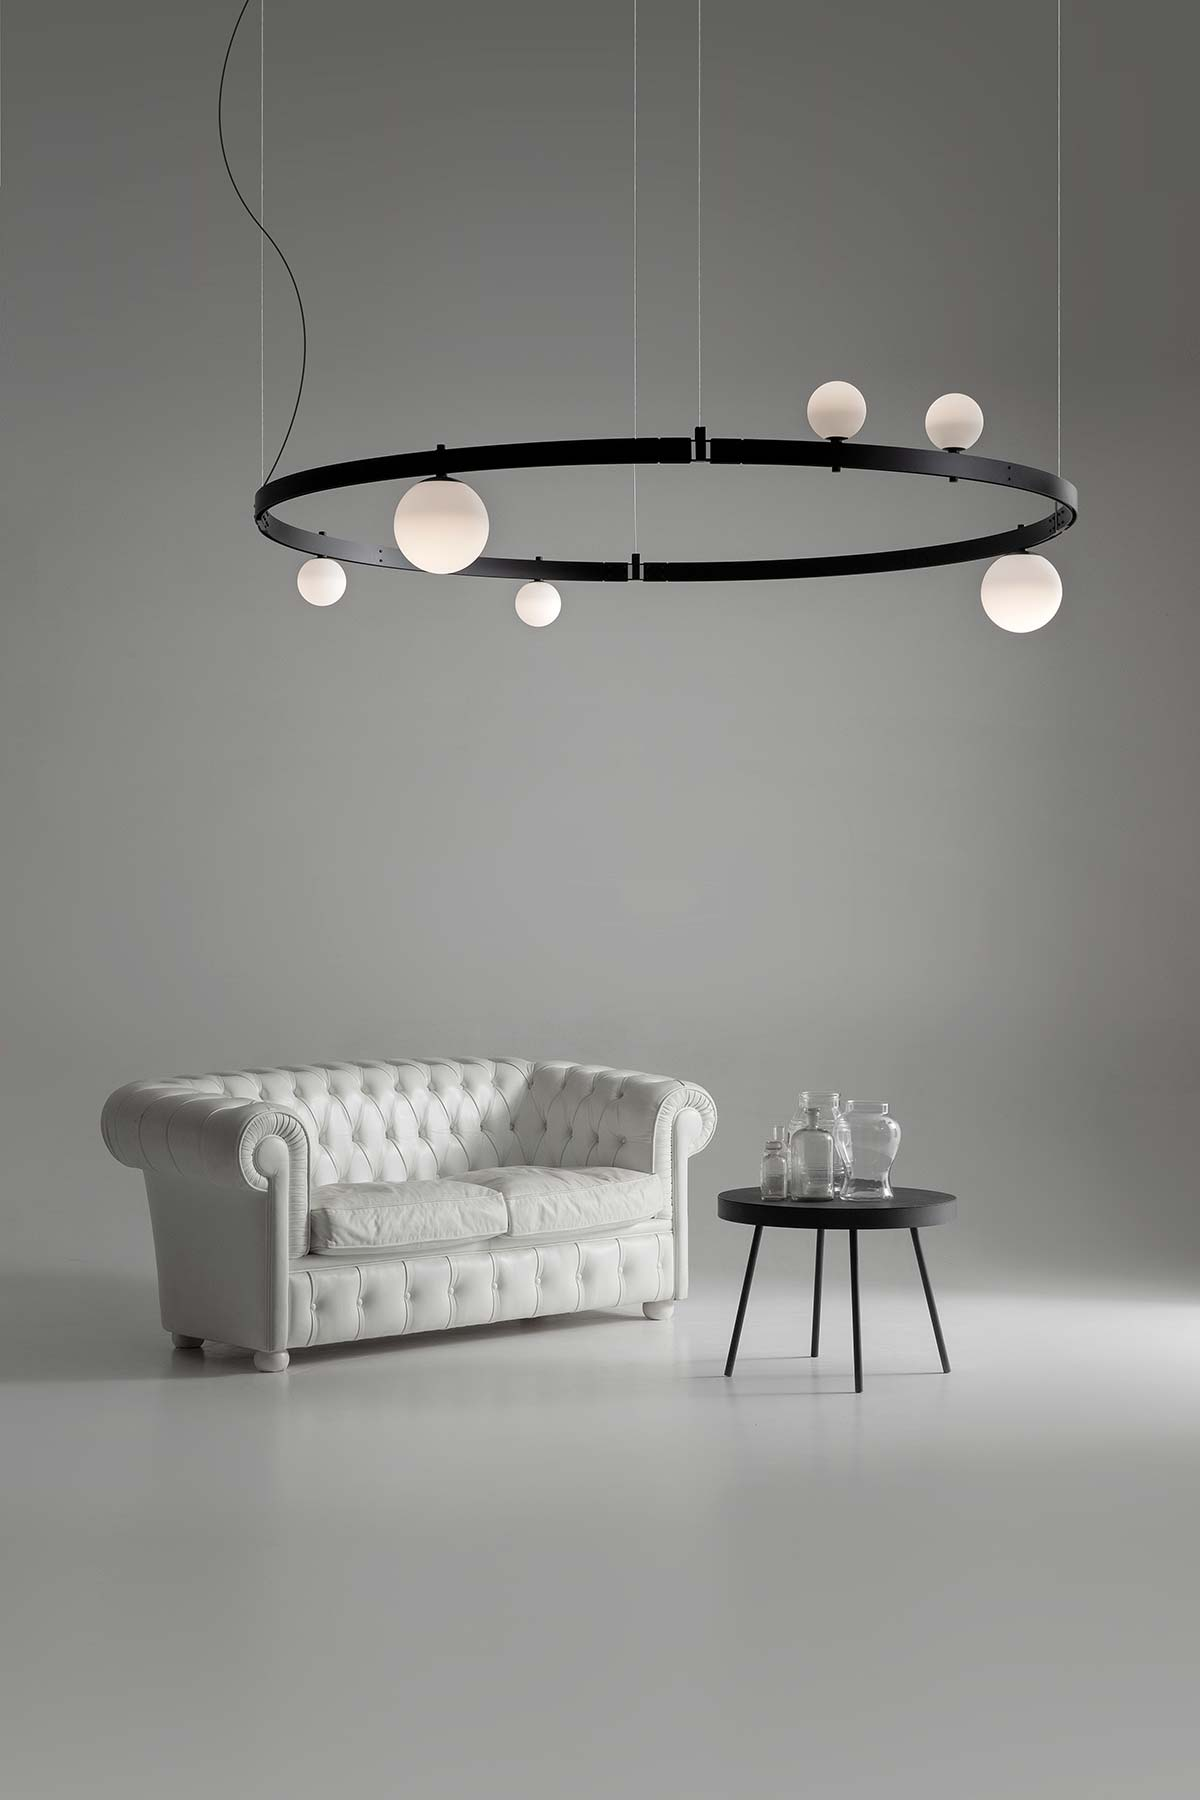 Stant by Karman, Design Edmondo Testaguzza